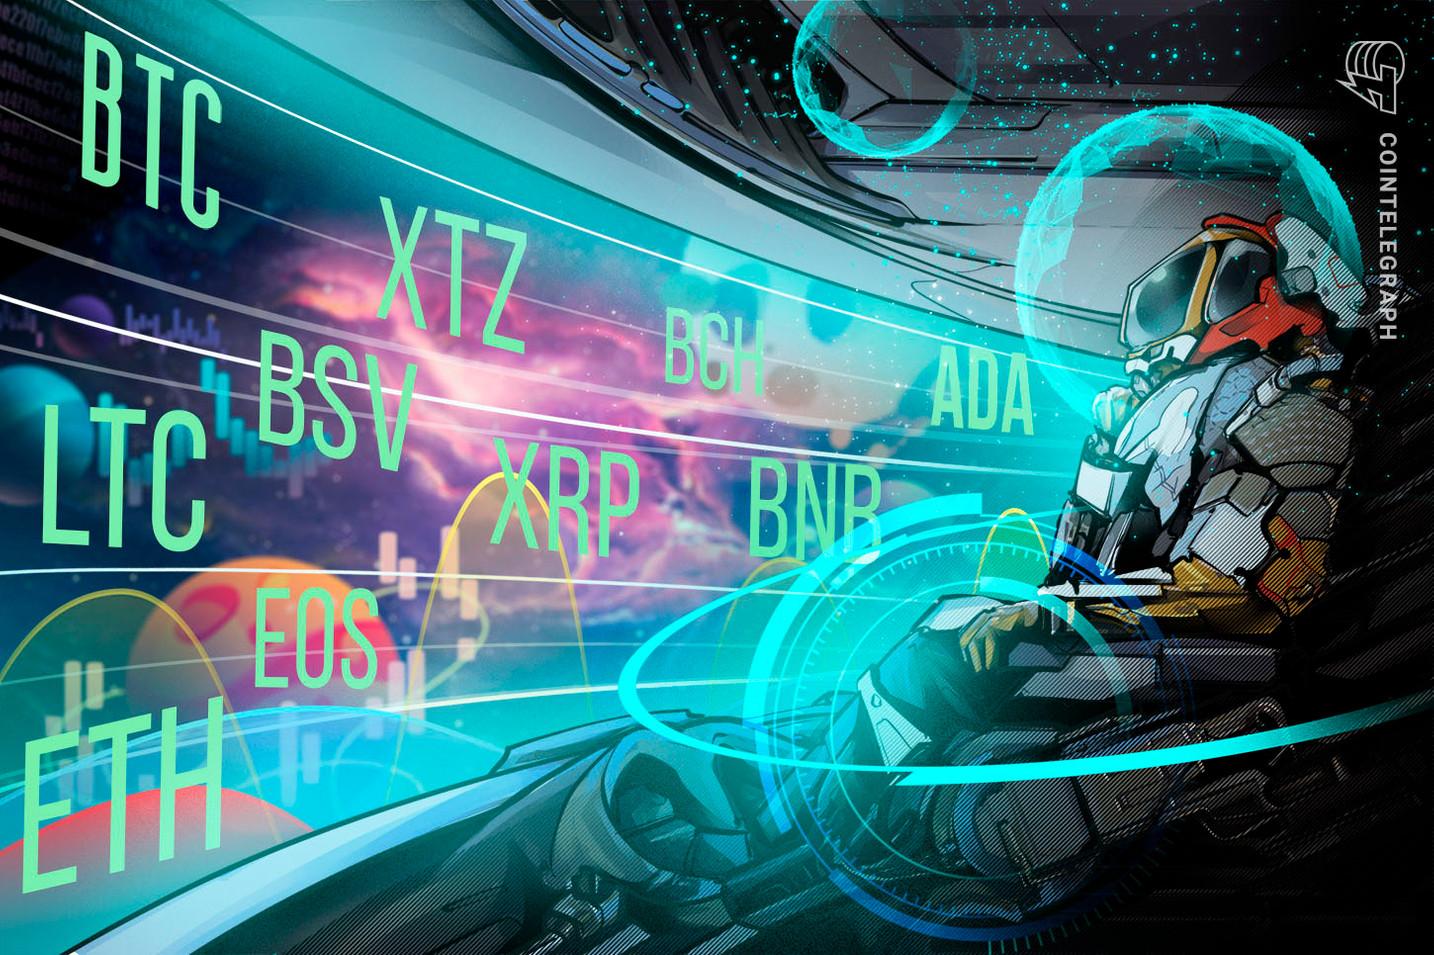 Price Analysis 5/27: BTC, ETH, XRP, BCH, BSV, LTC, BNB, EOS, XTZ, ADA